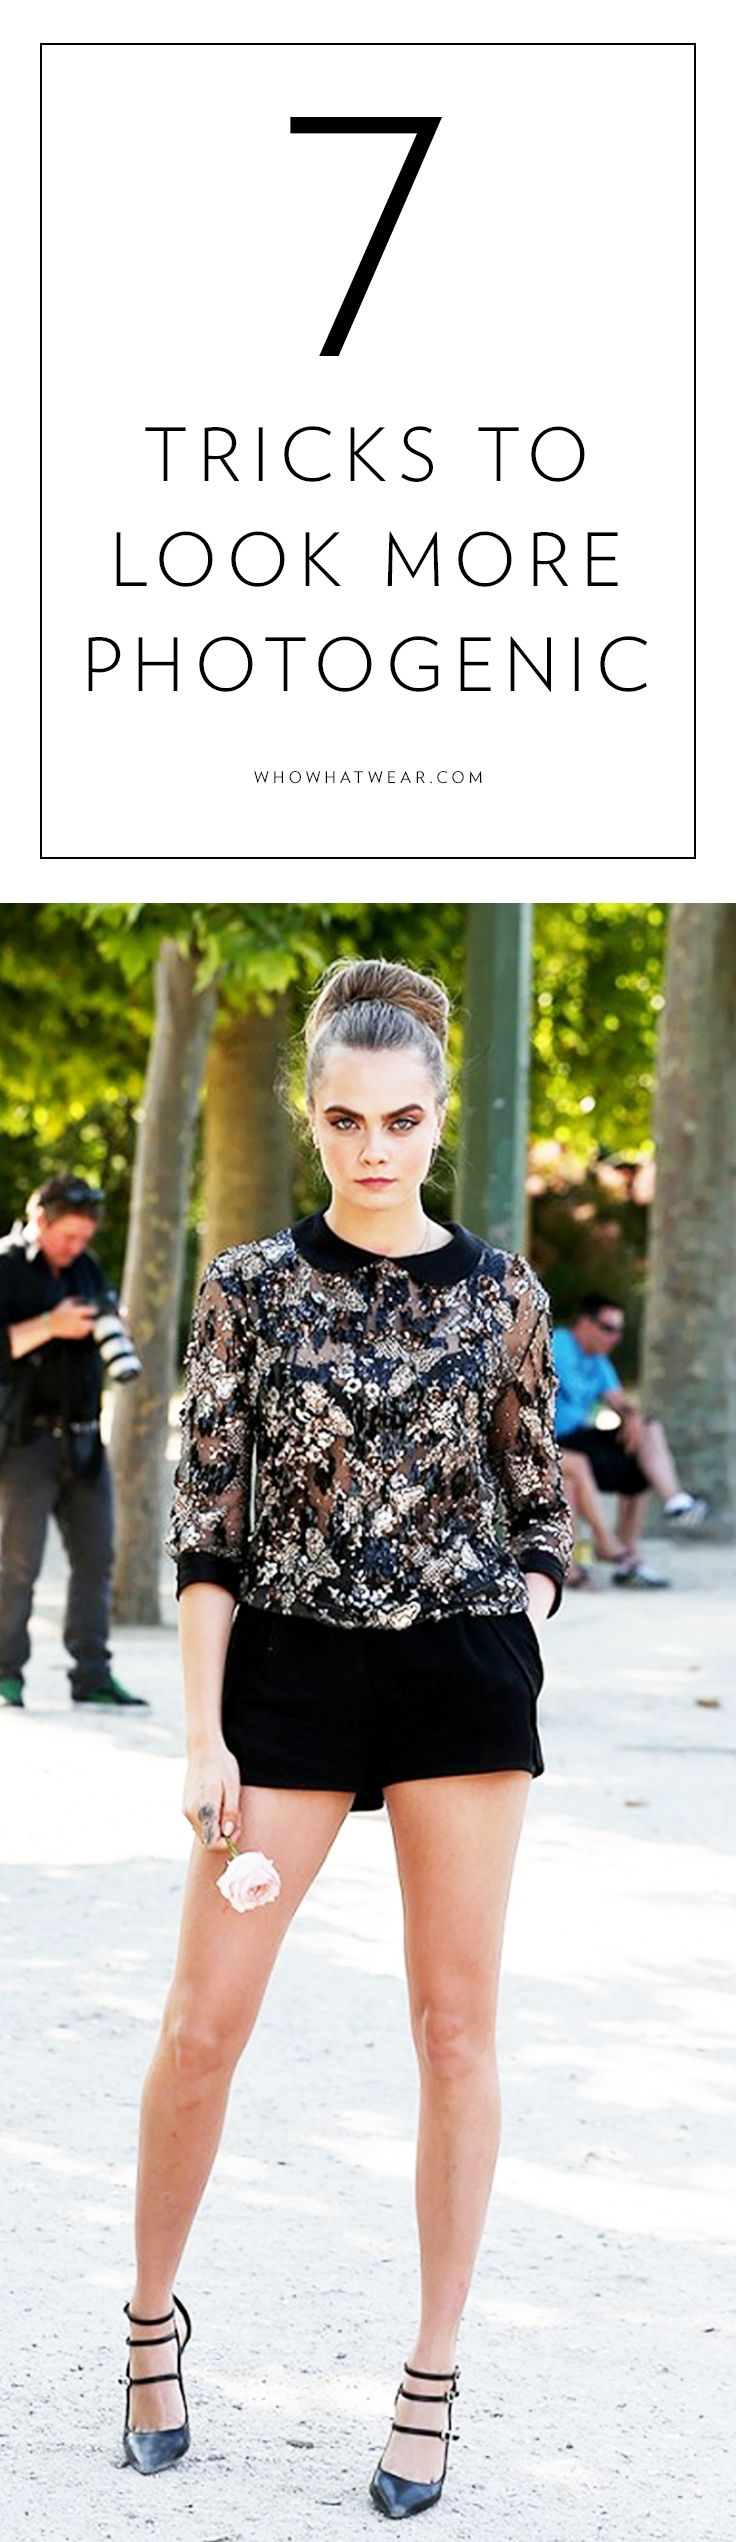 7 Tricks Celebrities Use to Look More Photogenic